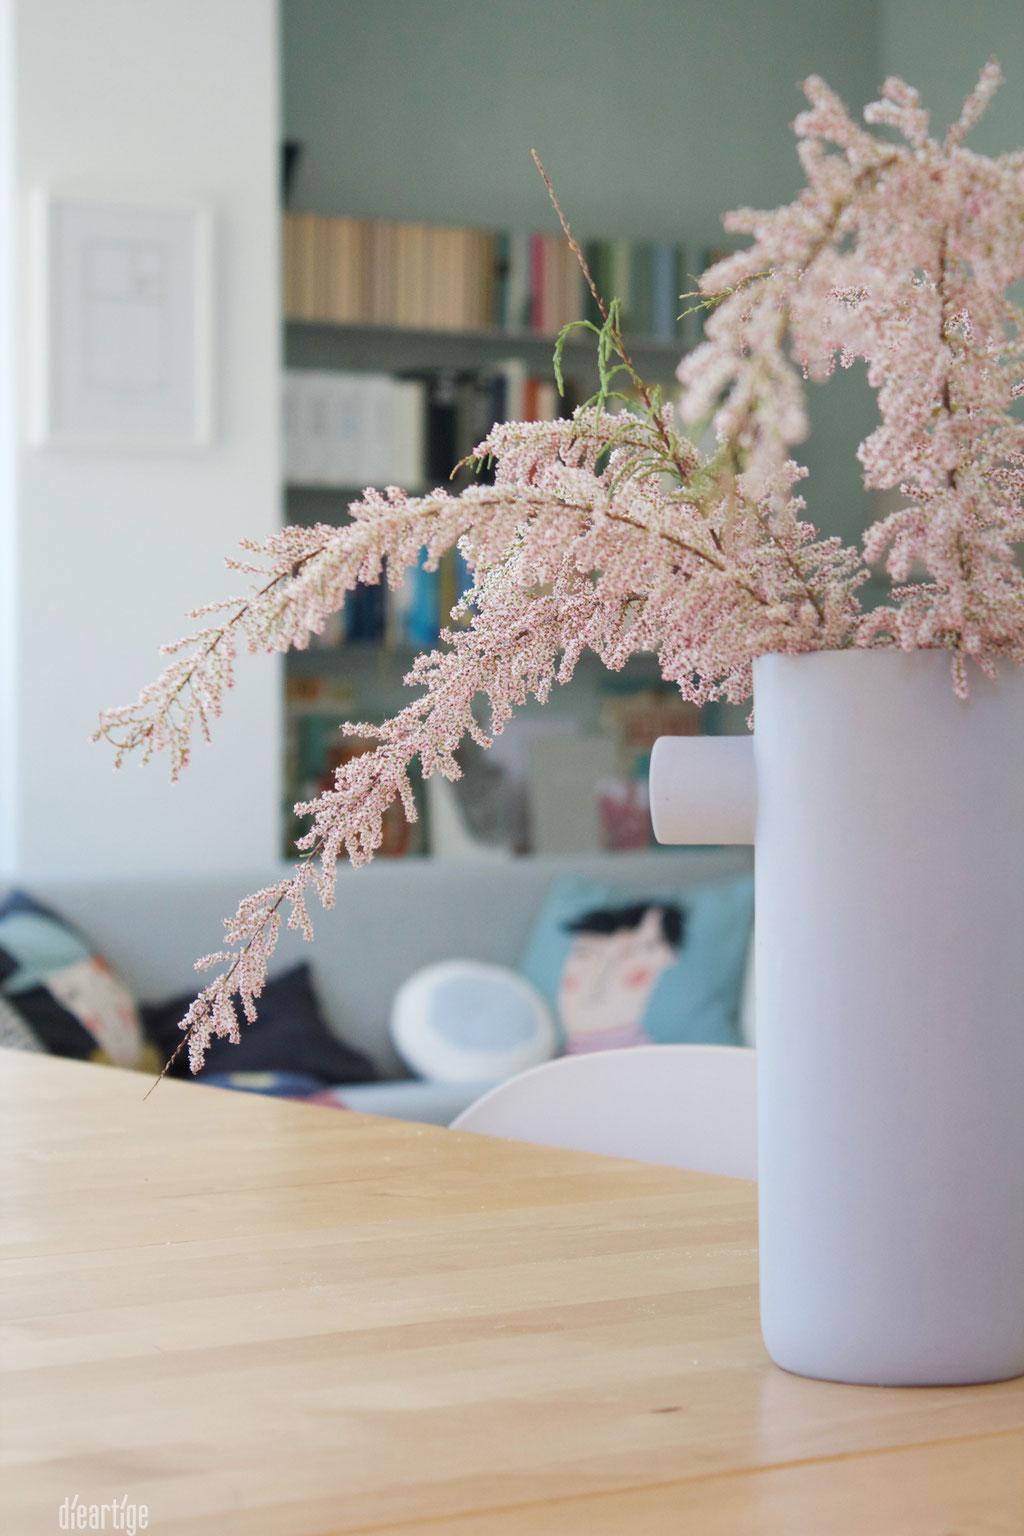 dieartigeBLOG - Special Guest: die Tamariske im Keramikkrug